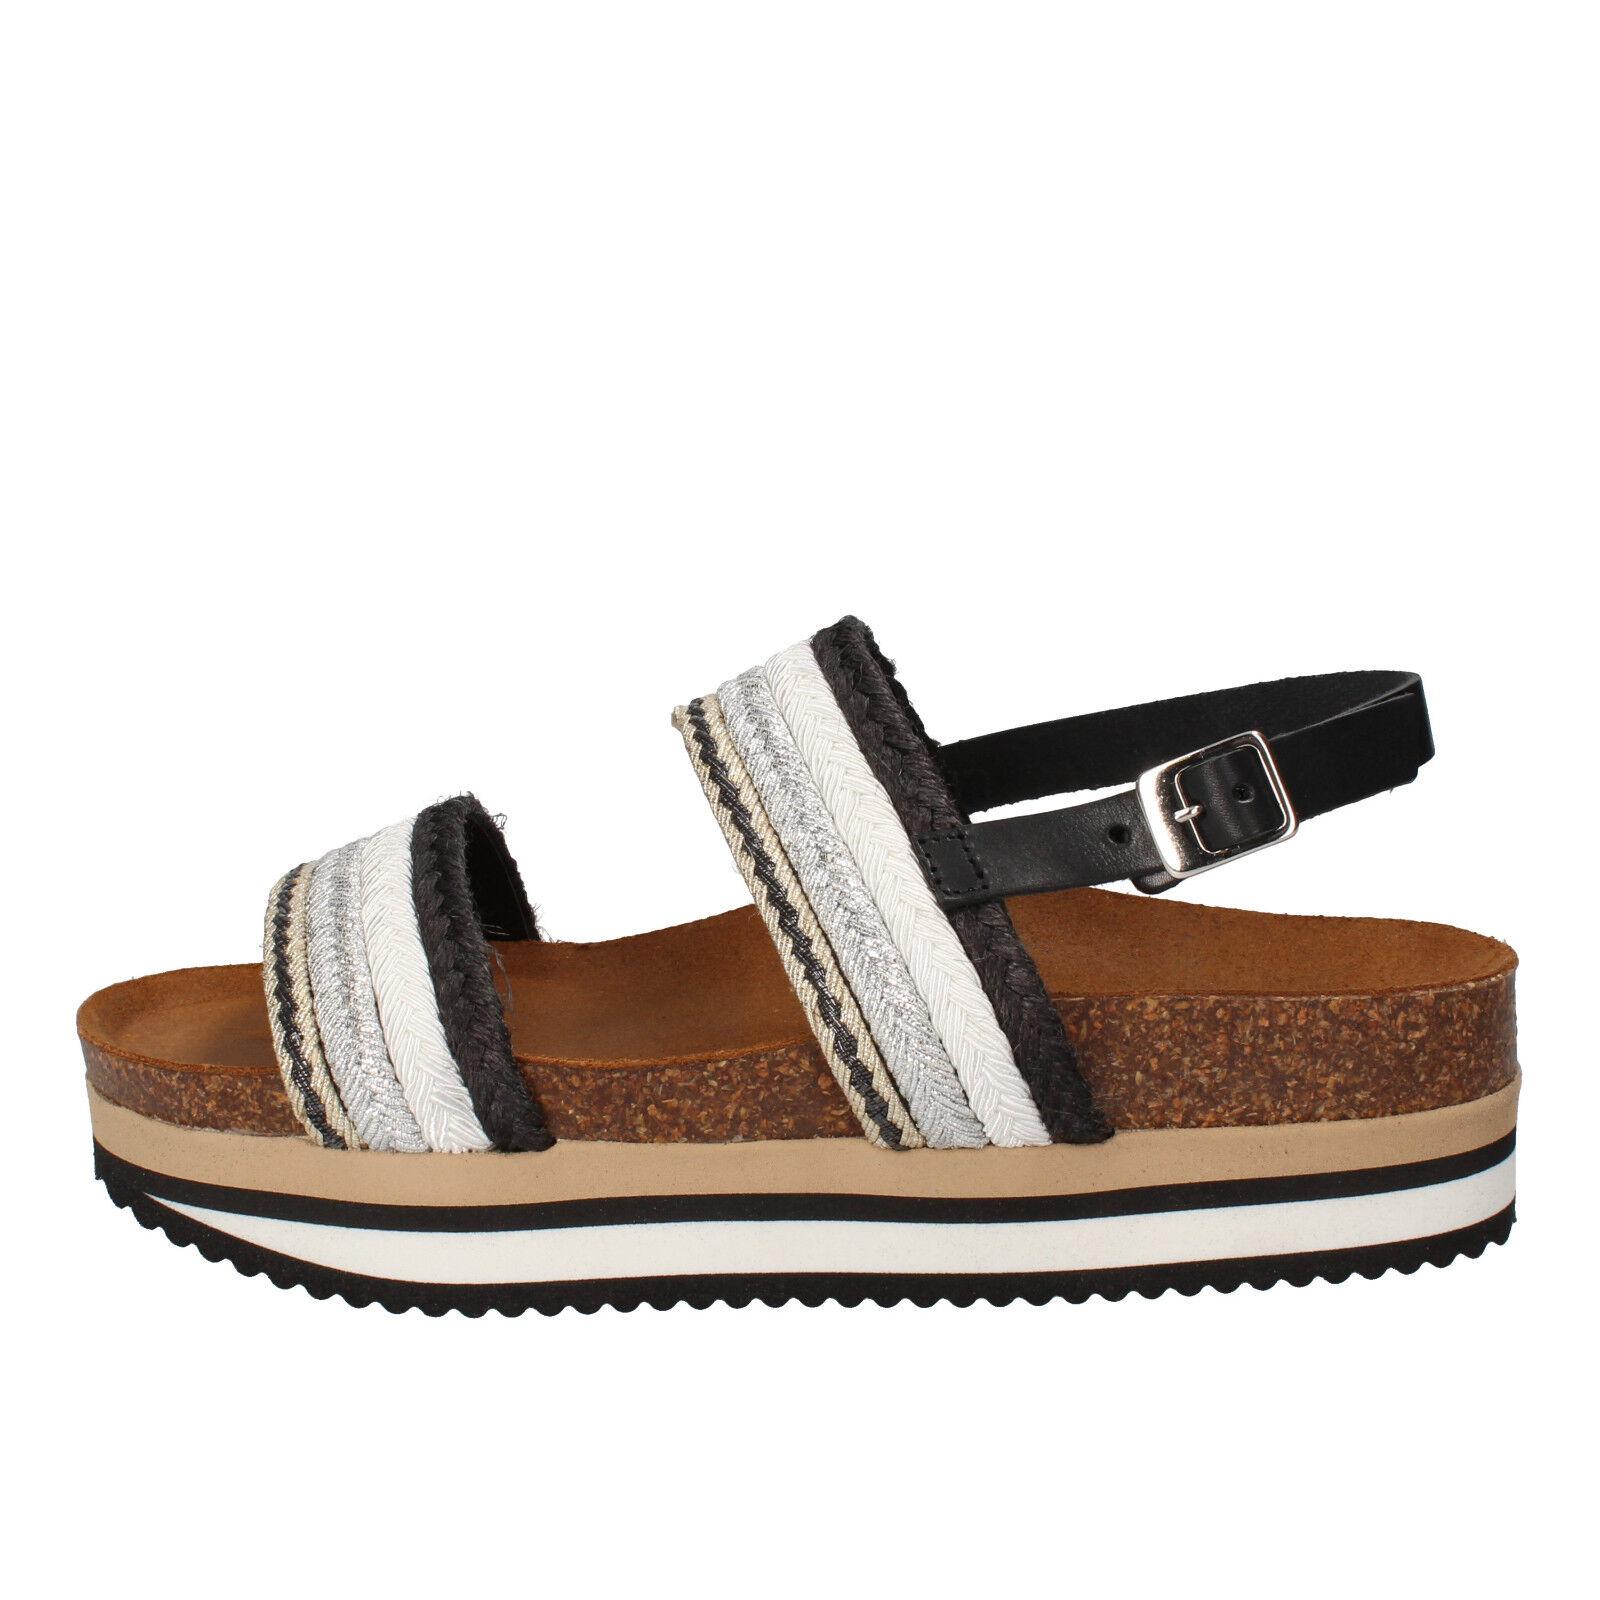 Scarpe donna EU 5 PRO JECT 38 EU donna sandali bianco nero tessuto AC590-C 7920c9